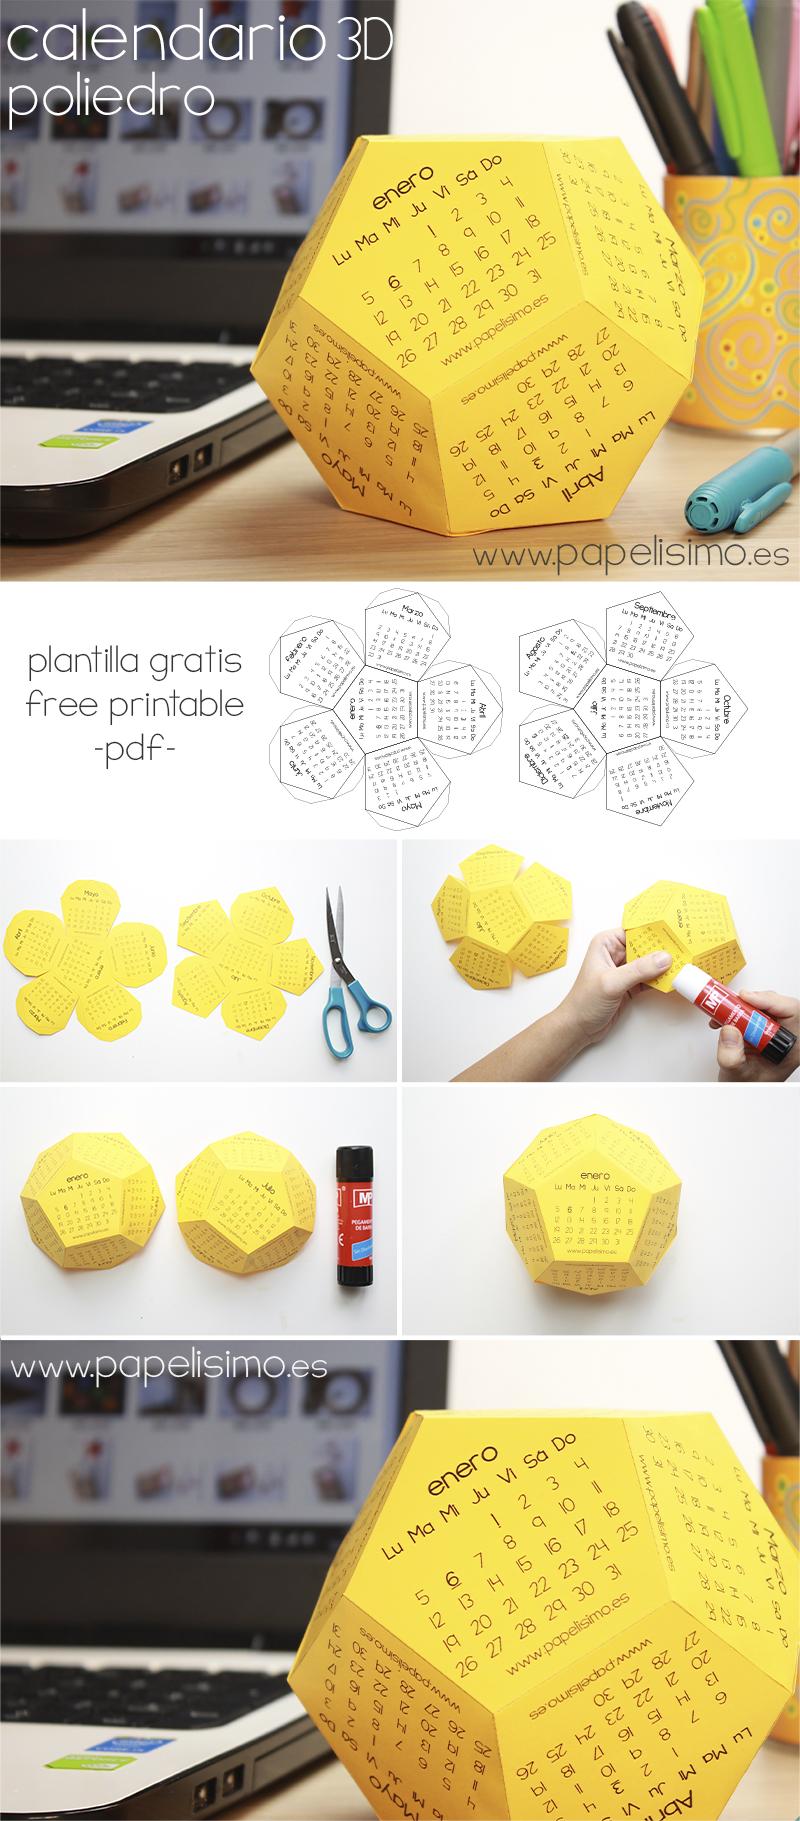 Calendario 2015 3d pdf gratis para imprimir papelisimo for Hacer tu casa en 3d